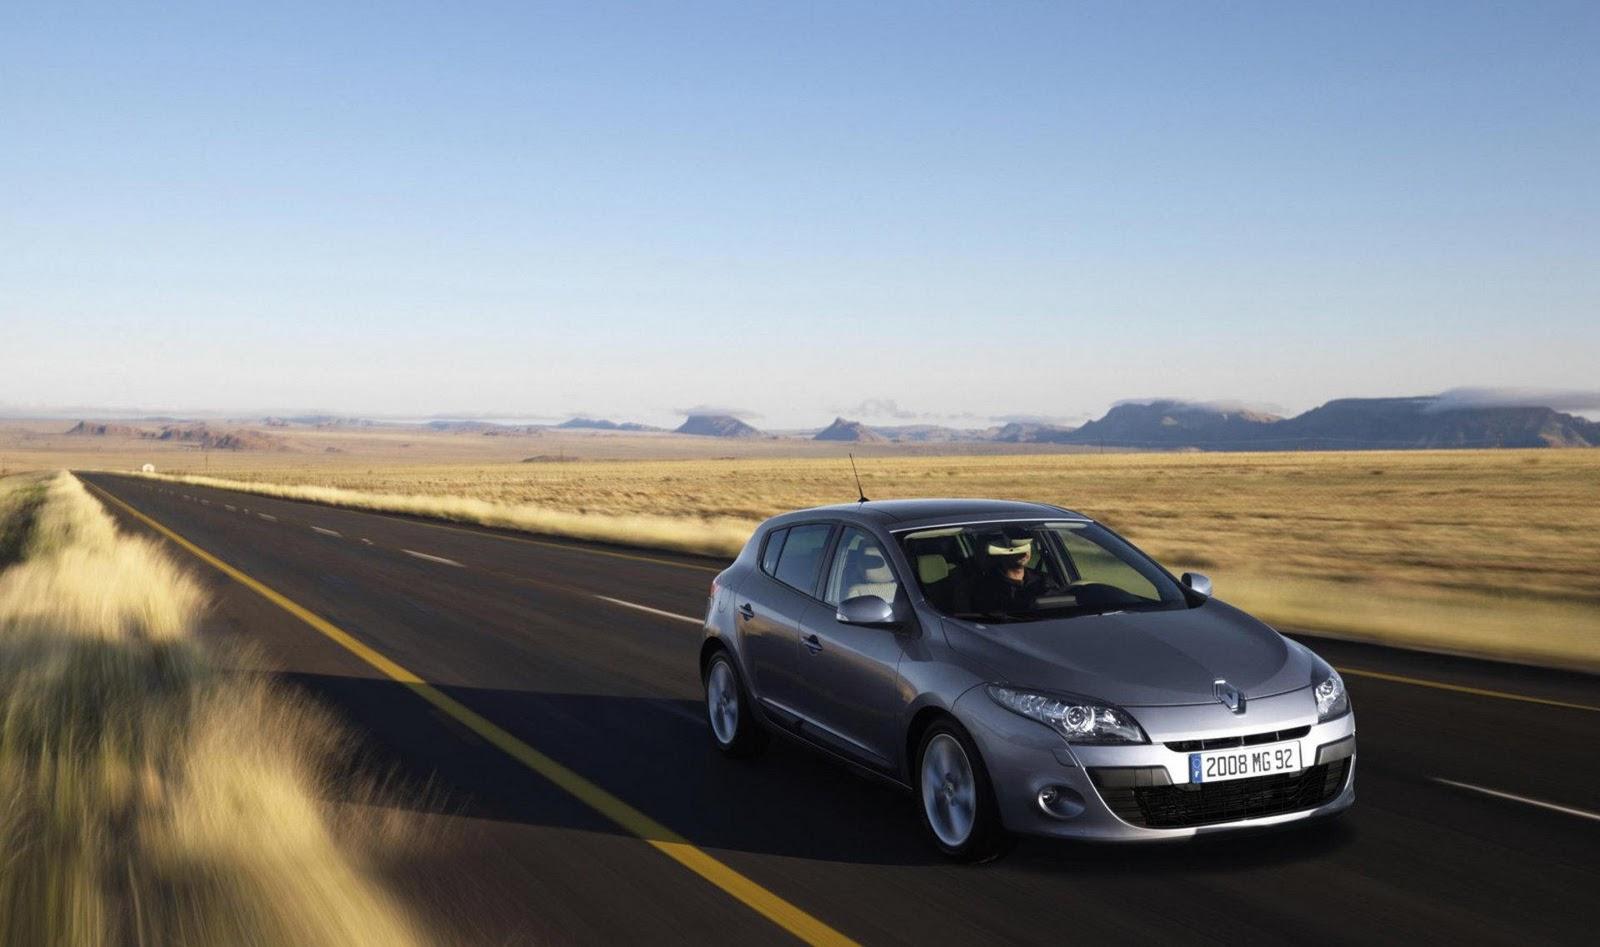 http://3.bp.blogspot.com/_7LQxj656qB0/TRzr4ZvRIdI/AAAAAAAAKHE/8zRfvpCXn1g/s1600/2009+Renault+Megane.jpg